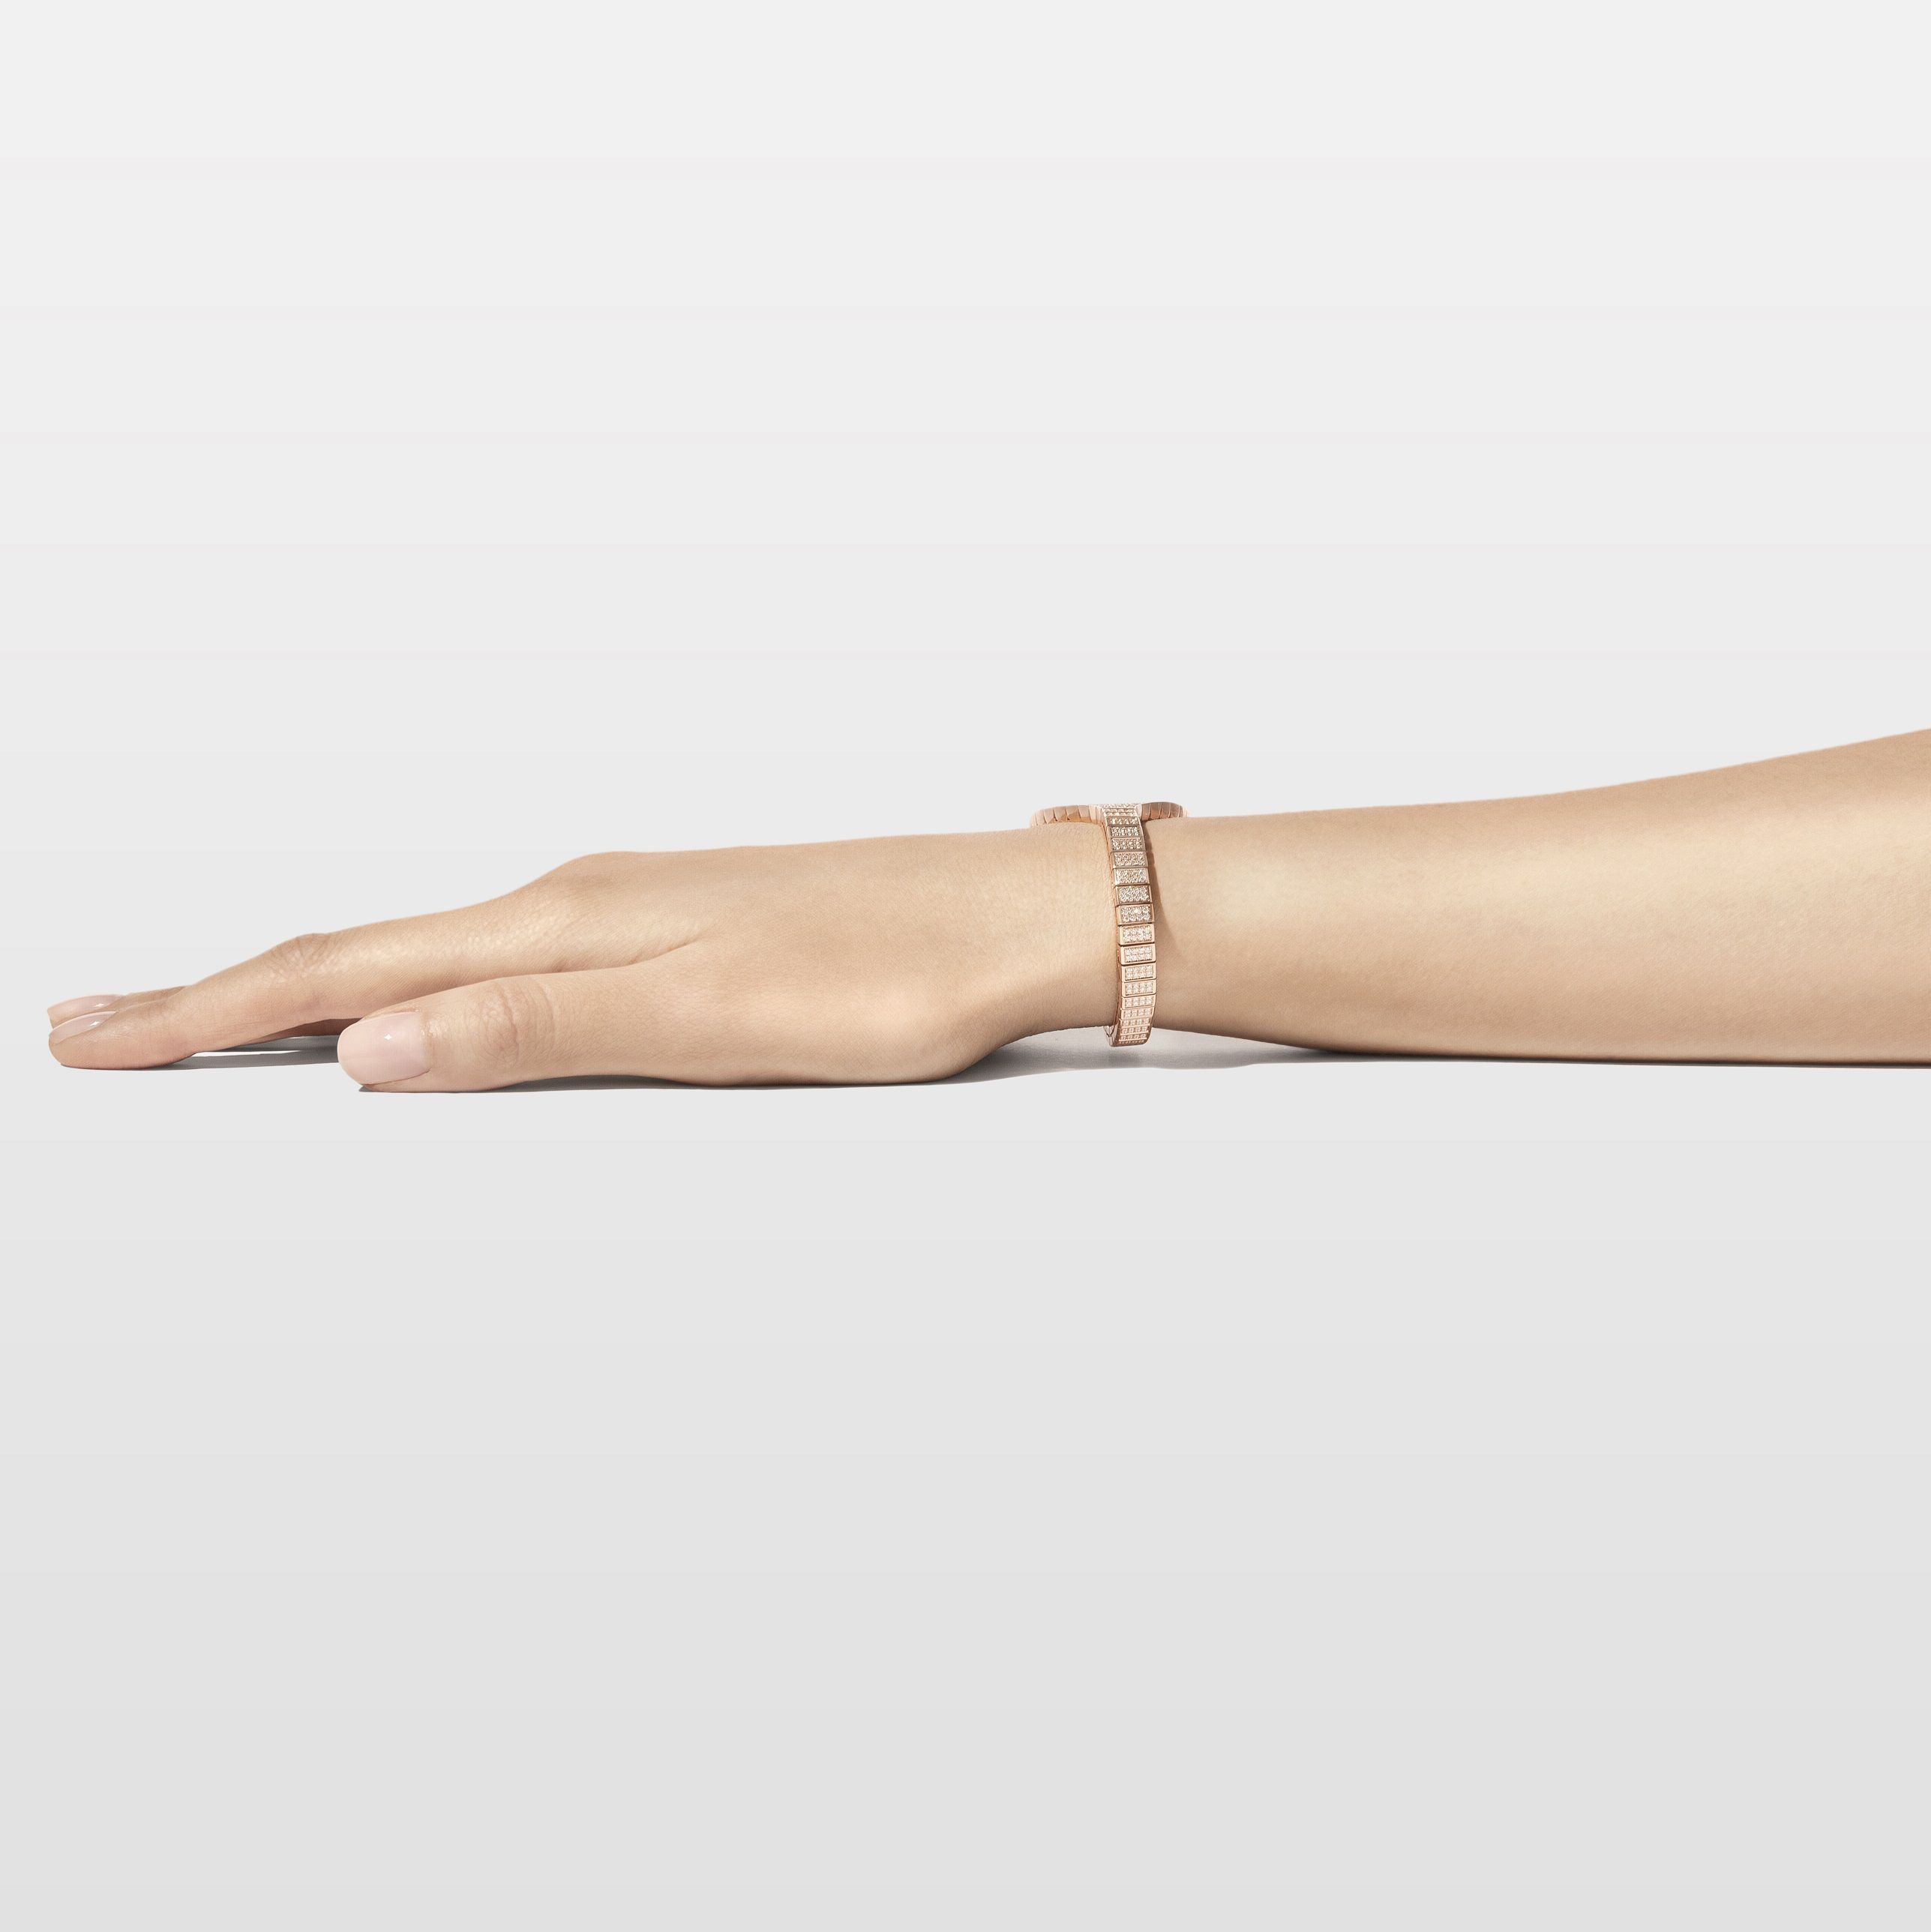 vanrycke-brandimage-styloïde-horizontal2